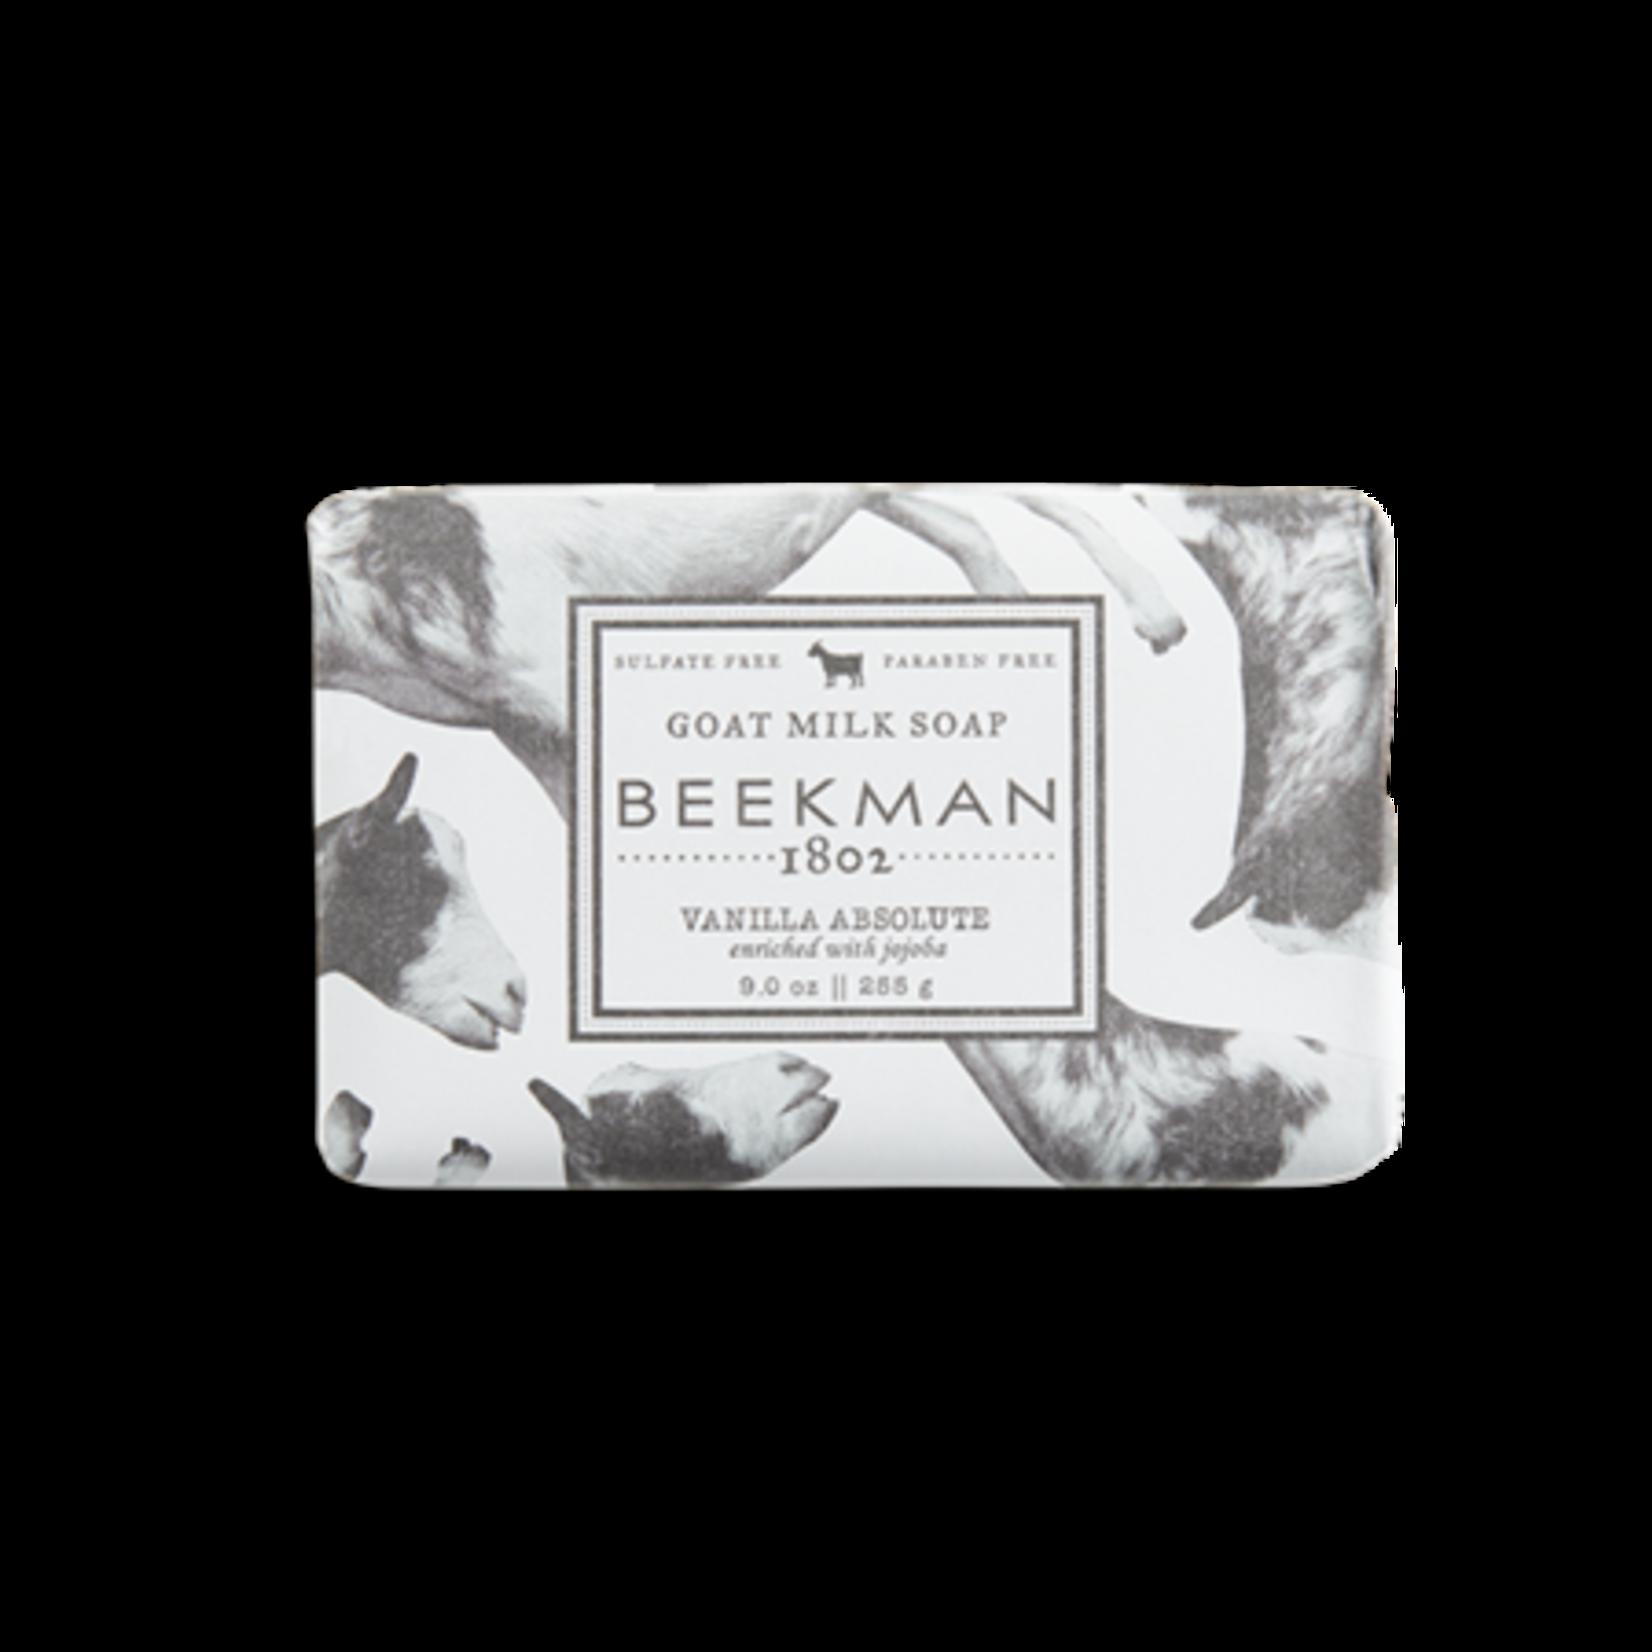 BEEKMAN 1802 Vanilla Absolute Goat Milk Soap